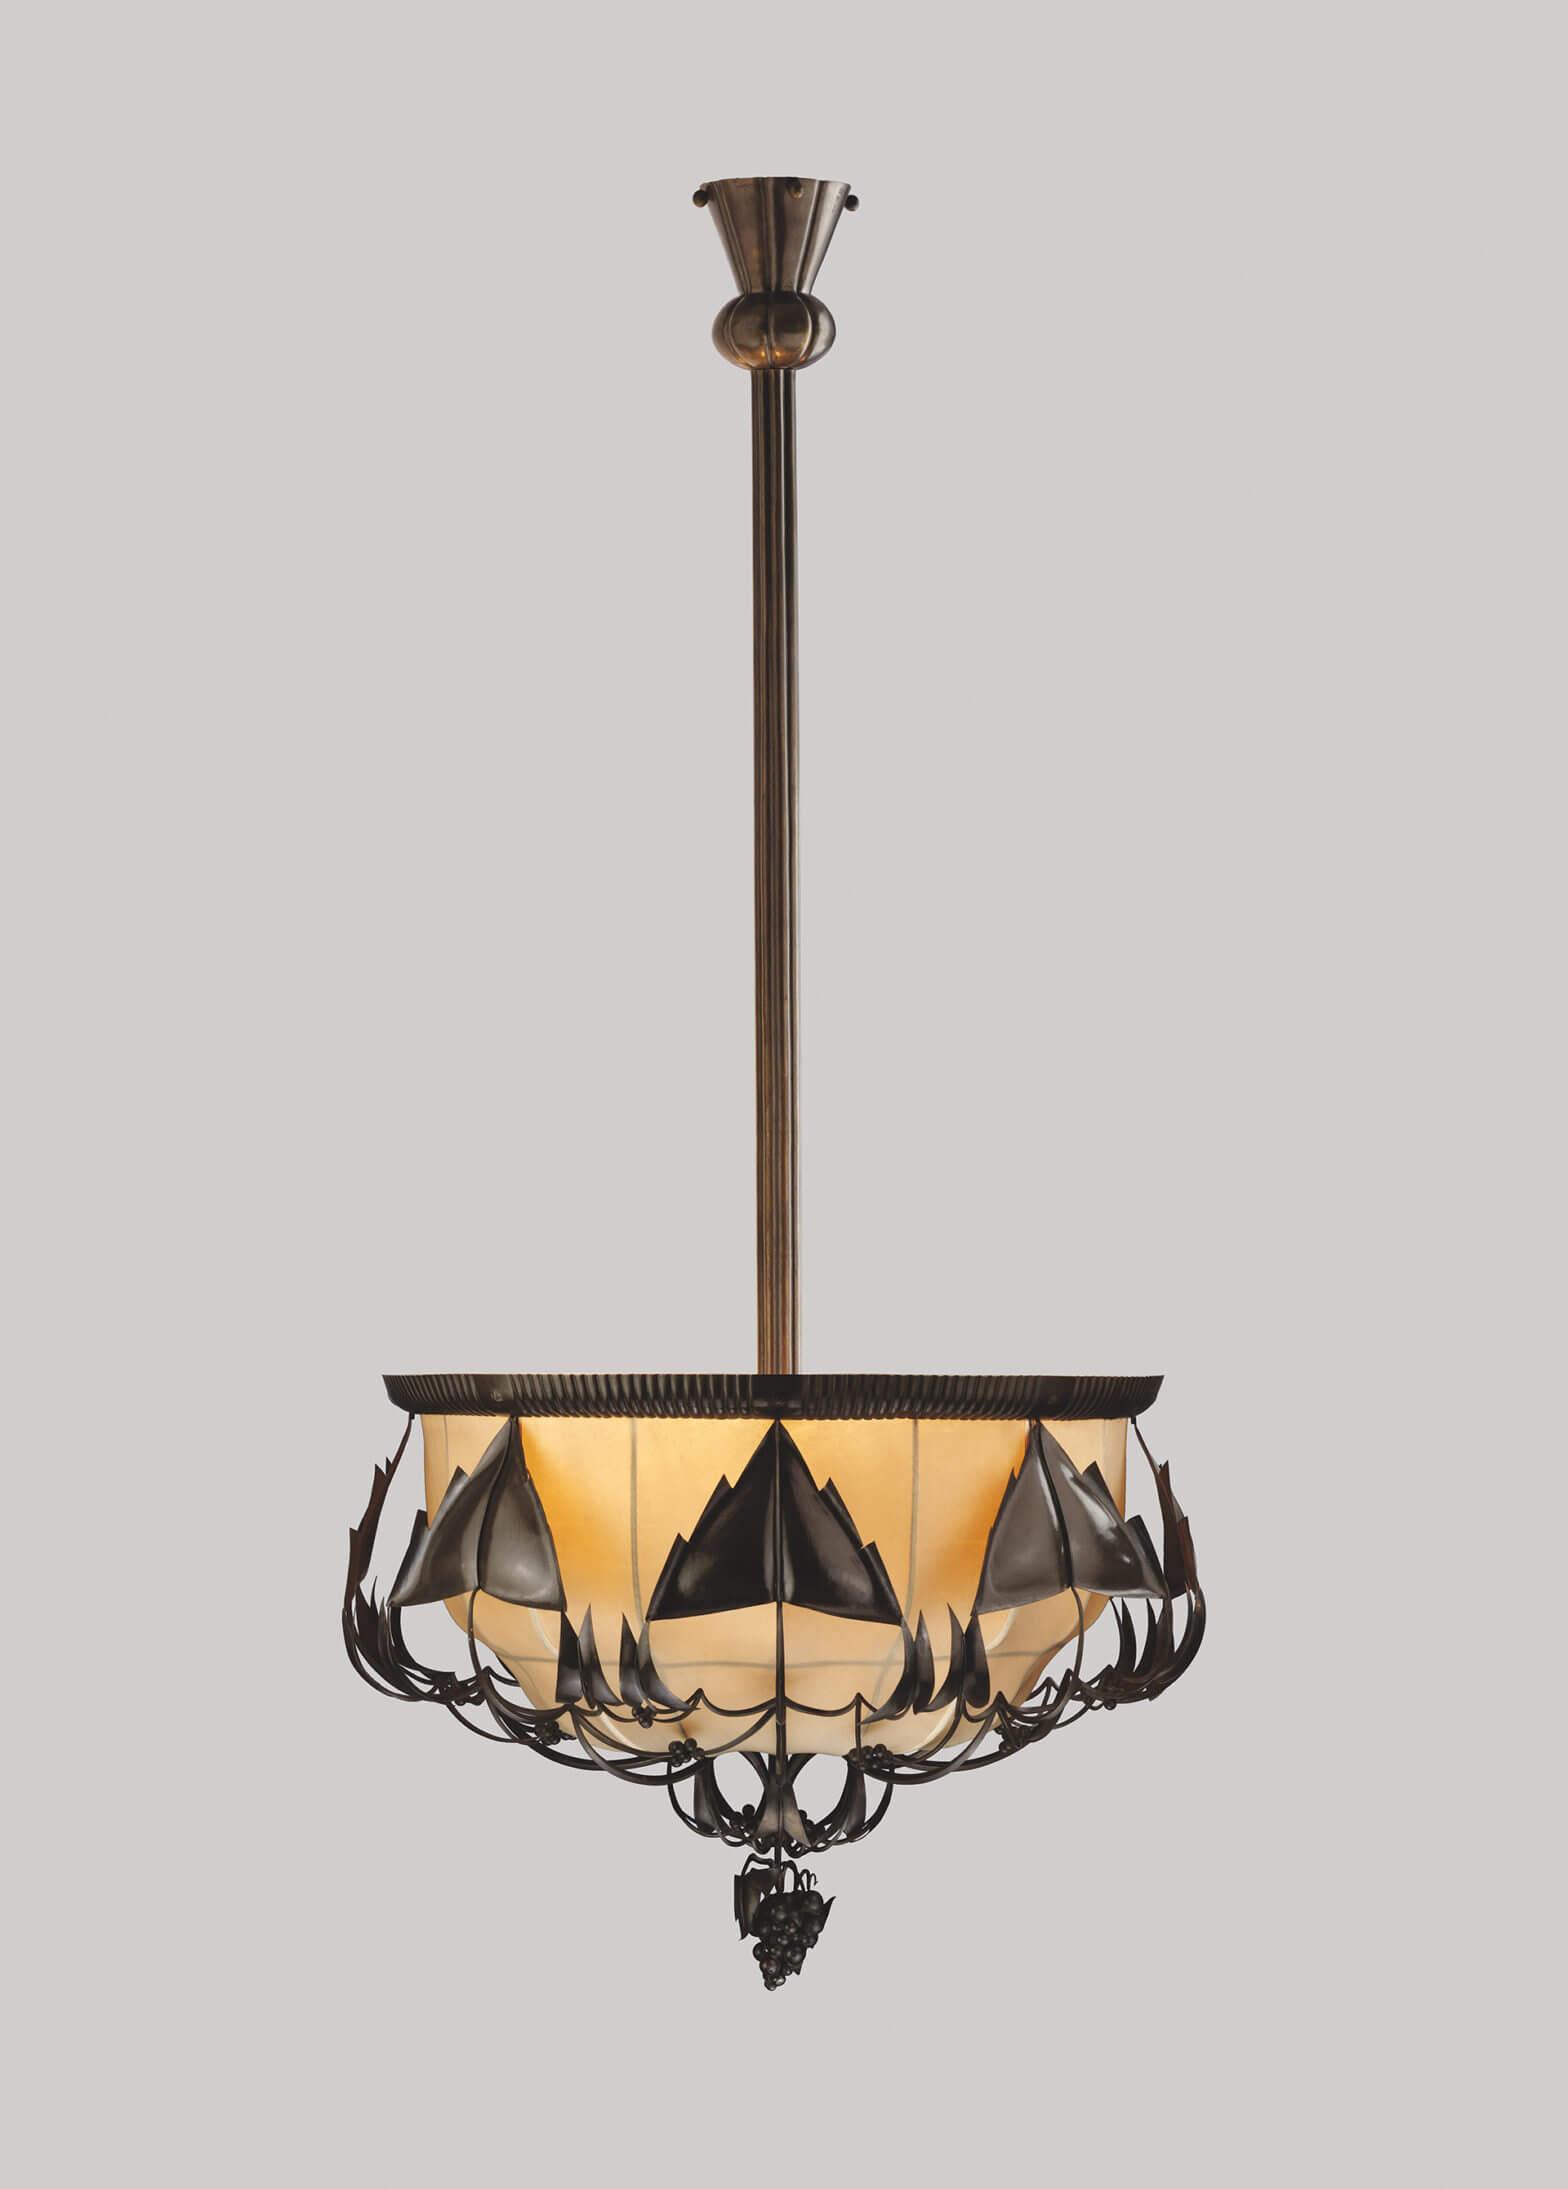 Dagobert Peche - Ceiling lamp